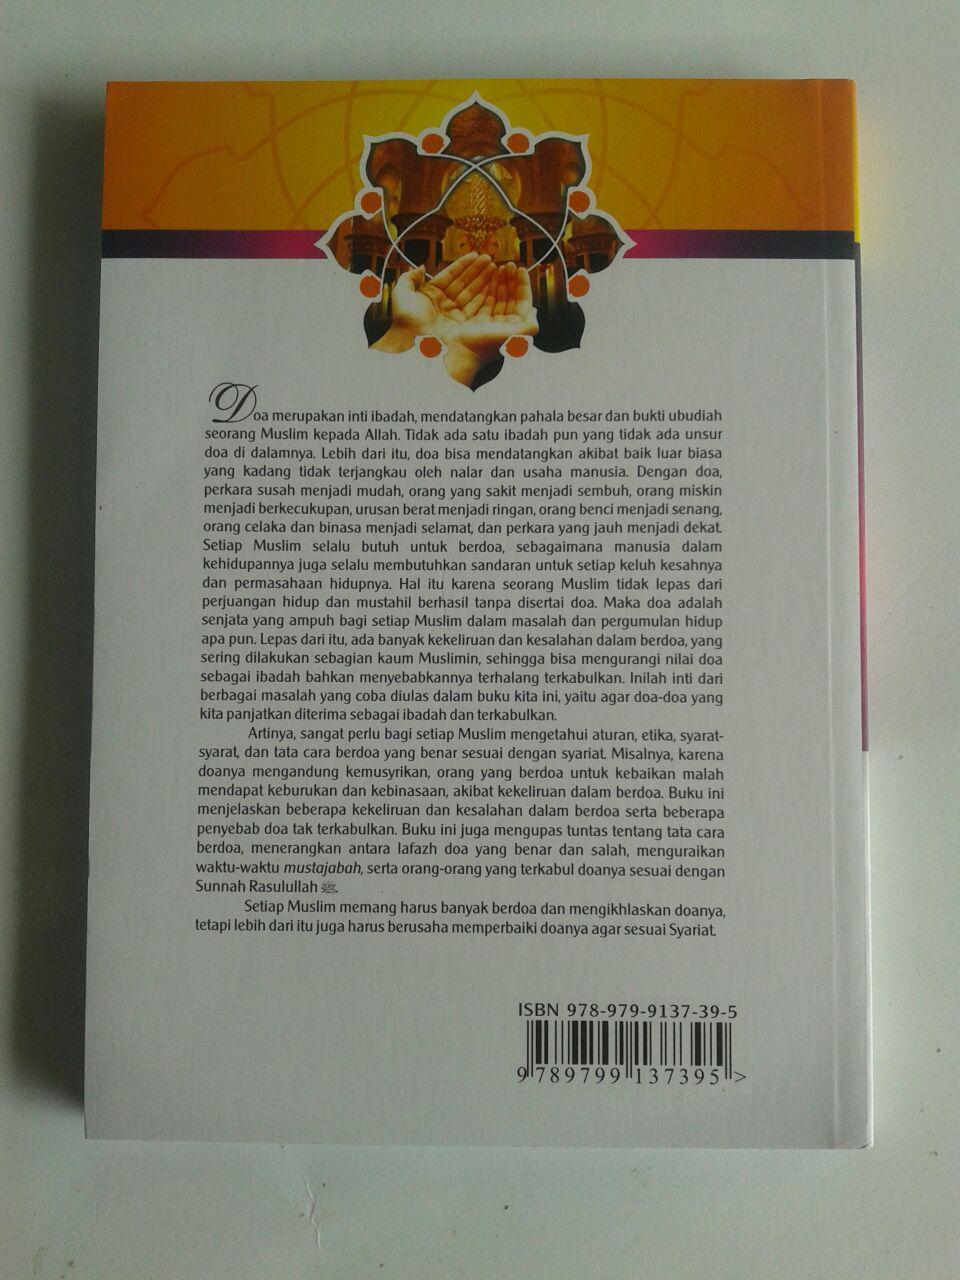 Buku Kesalahan Kesalahan Dalam Berdoa cover